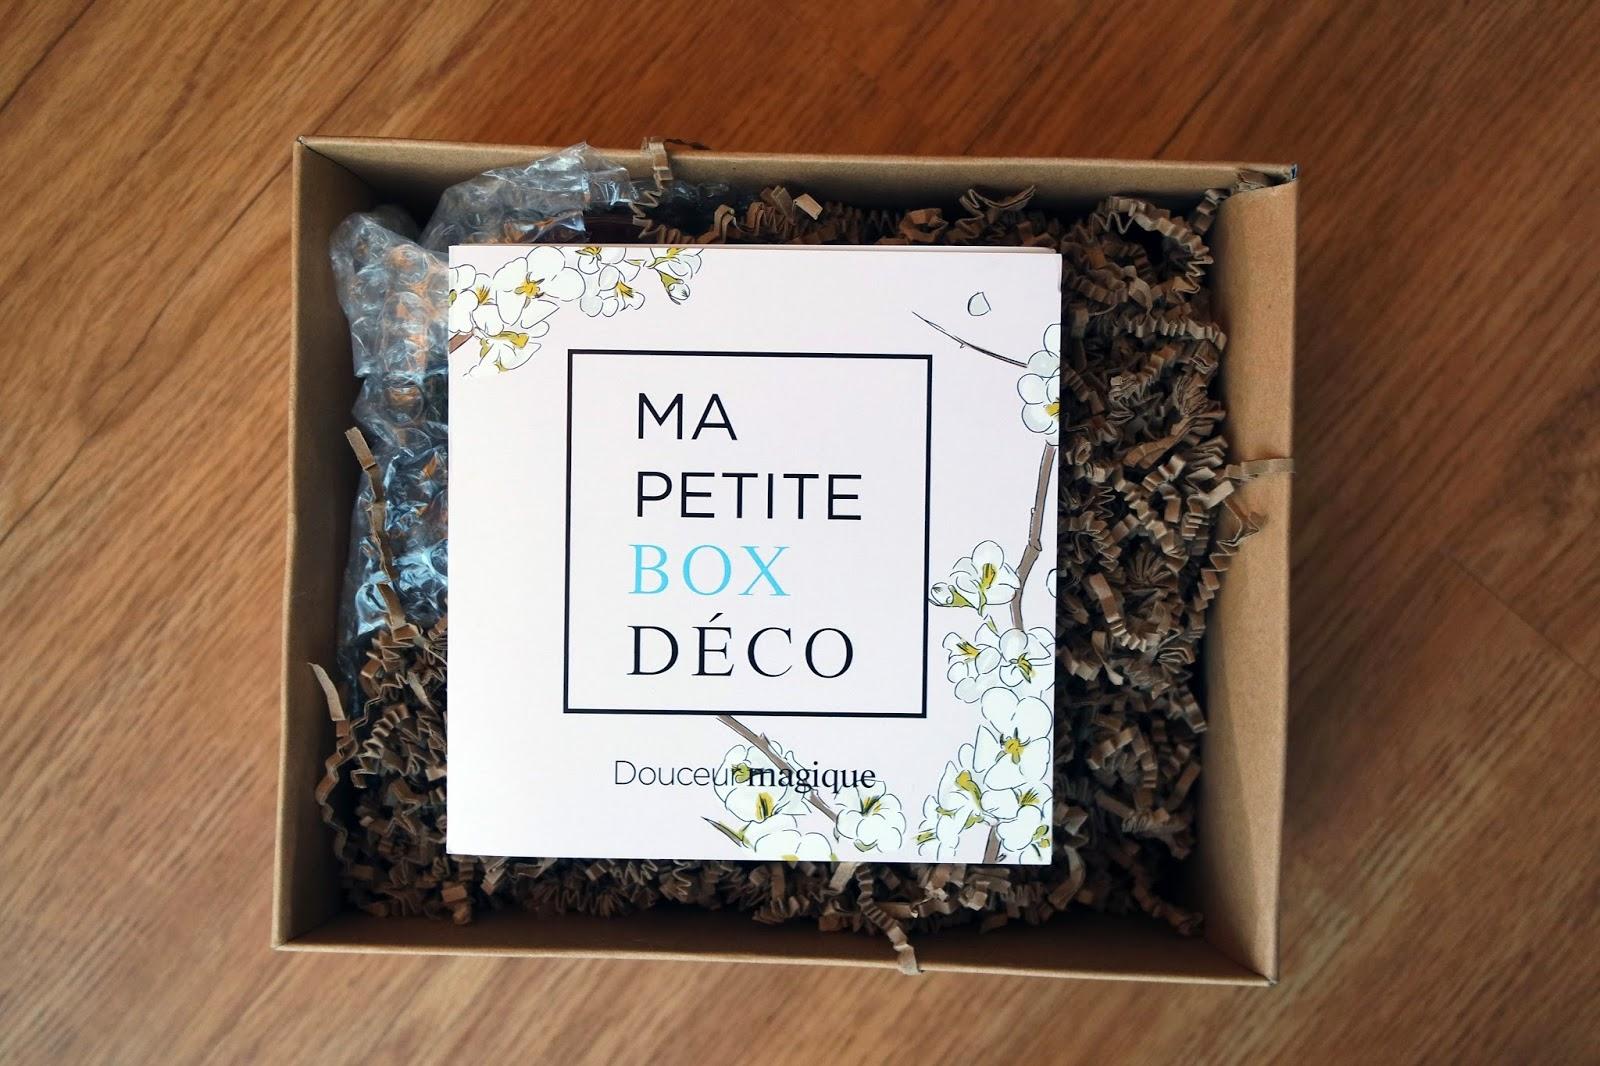 home ] ma petite box déco : douceur magique ~ smoothie bikini - blog